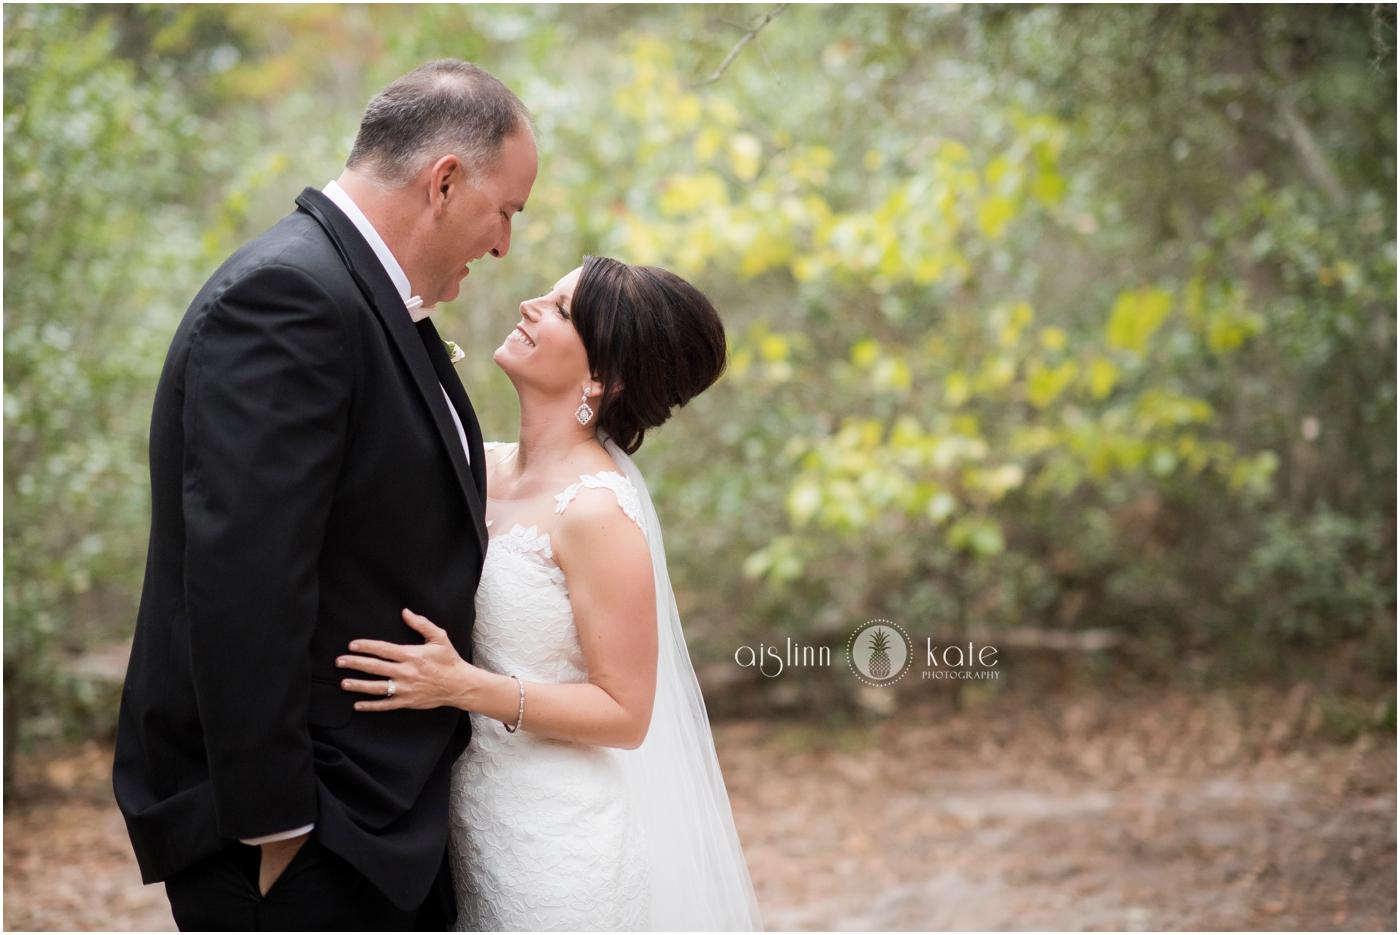 Pensacola-Destin-Wedding-Photographer_9470.jpg